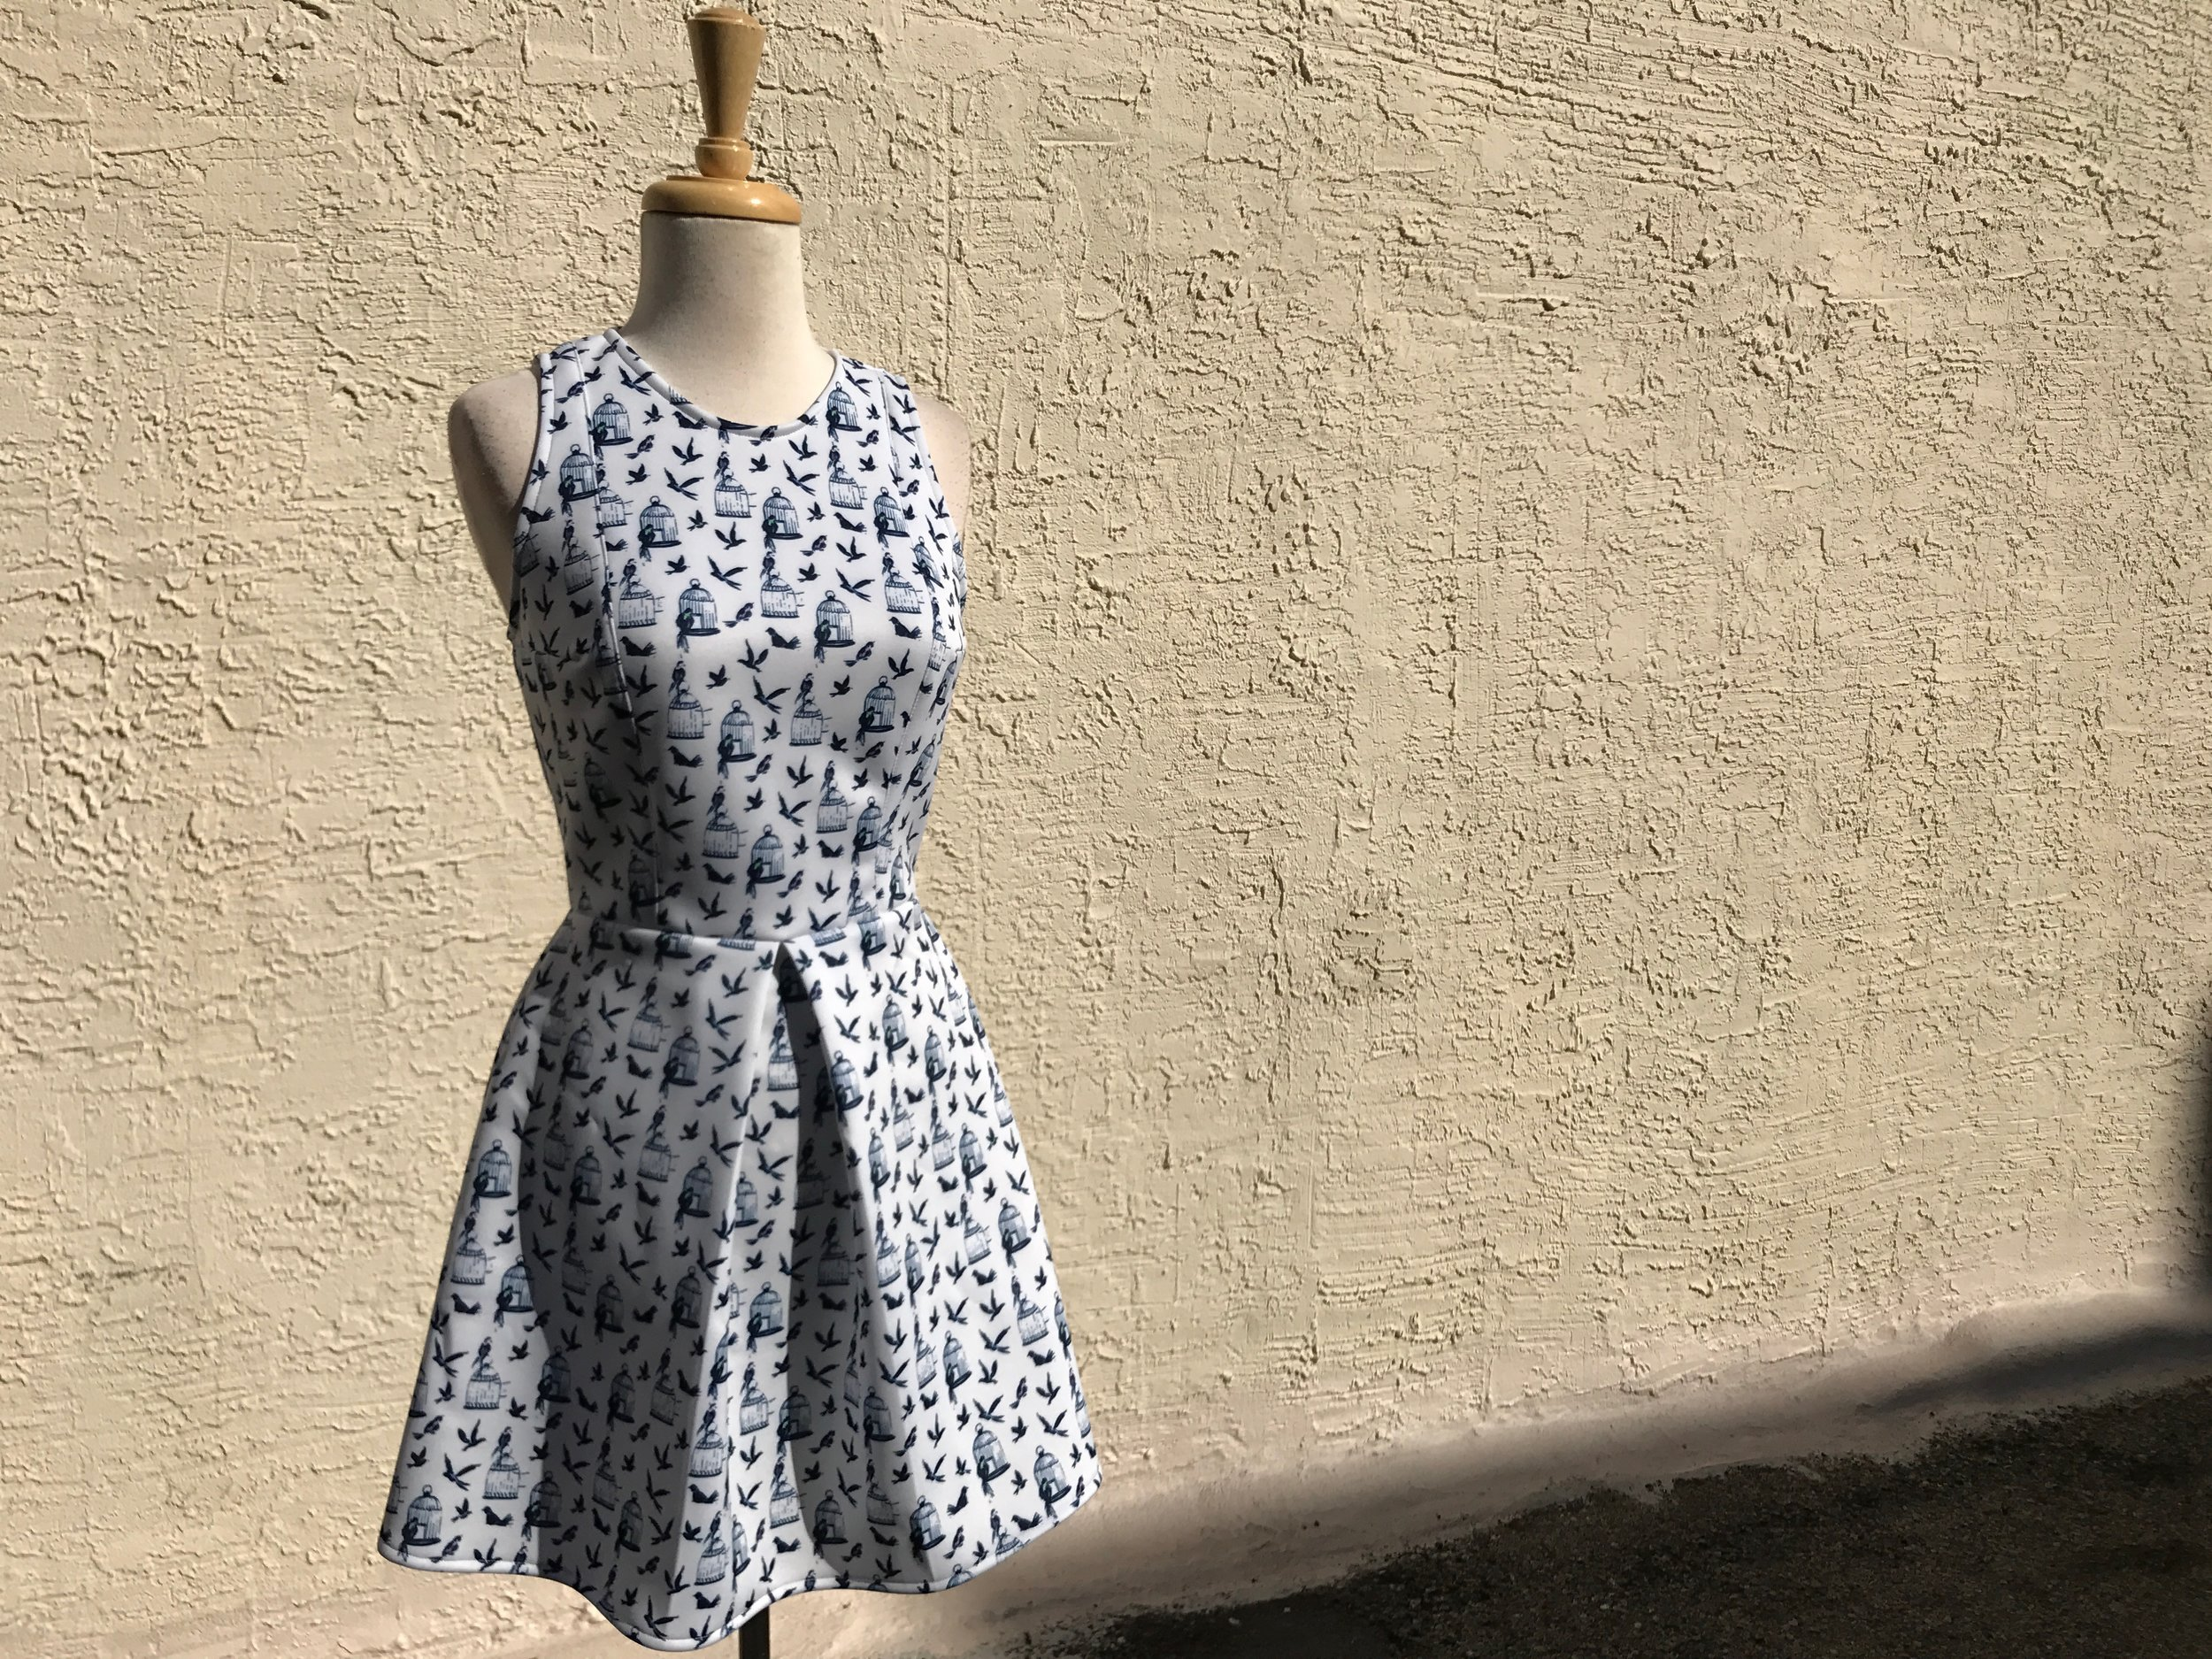 Earl Salko Pleat Skirt Dress.jpg